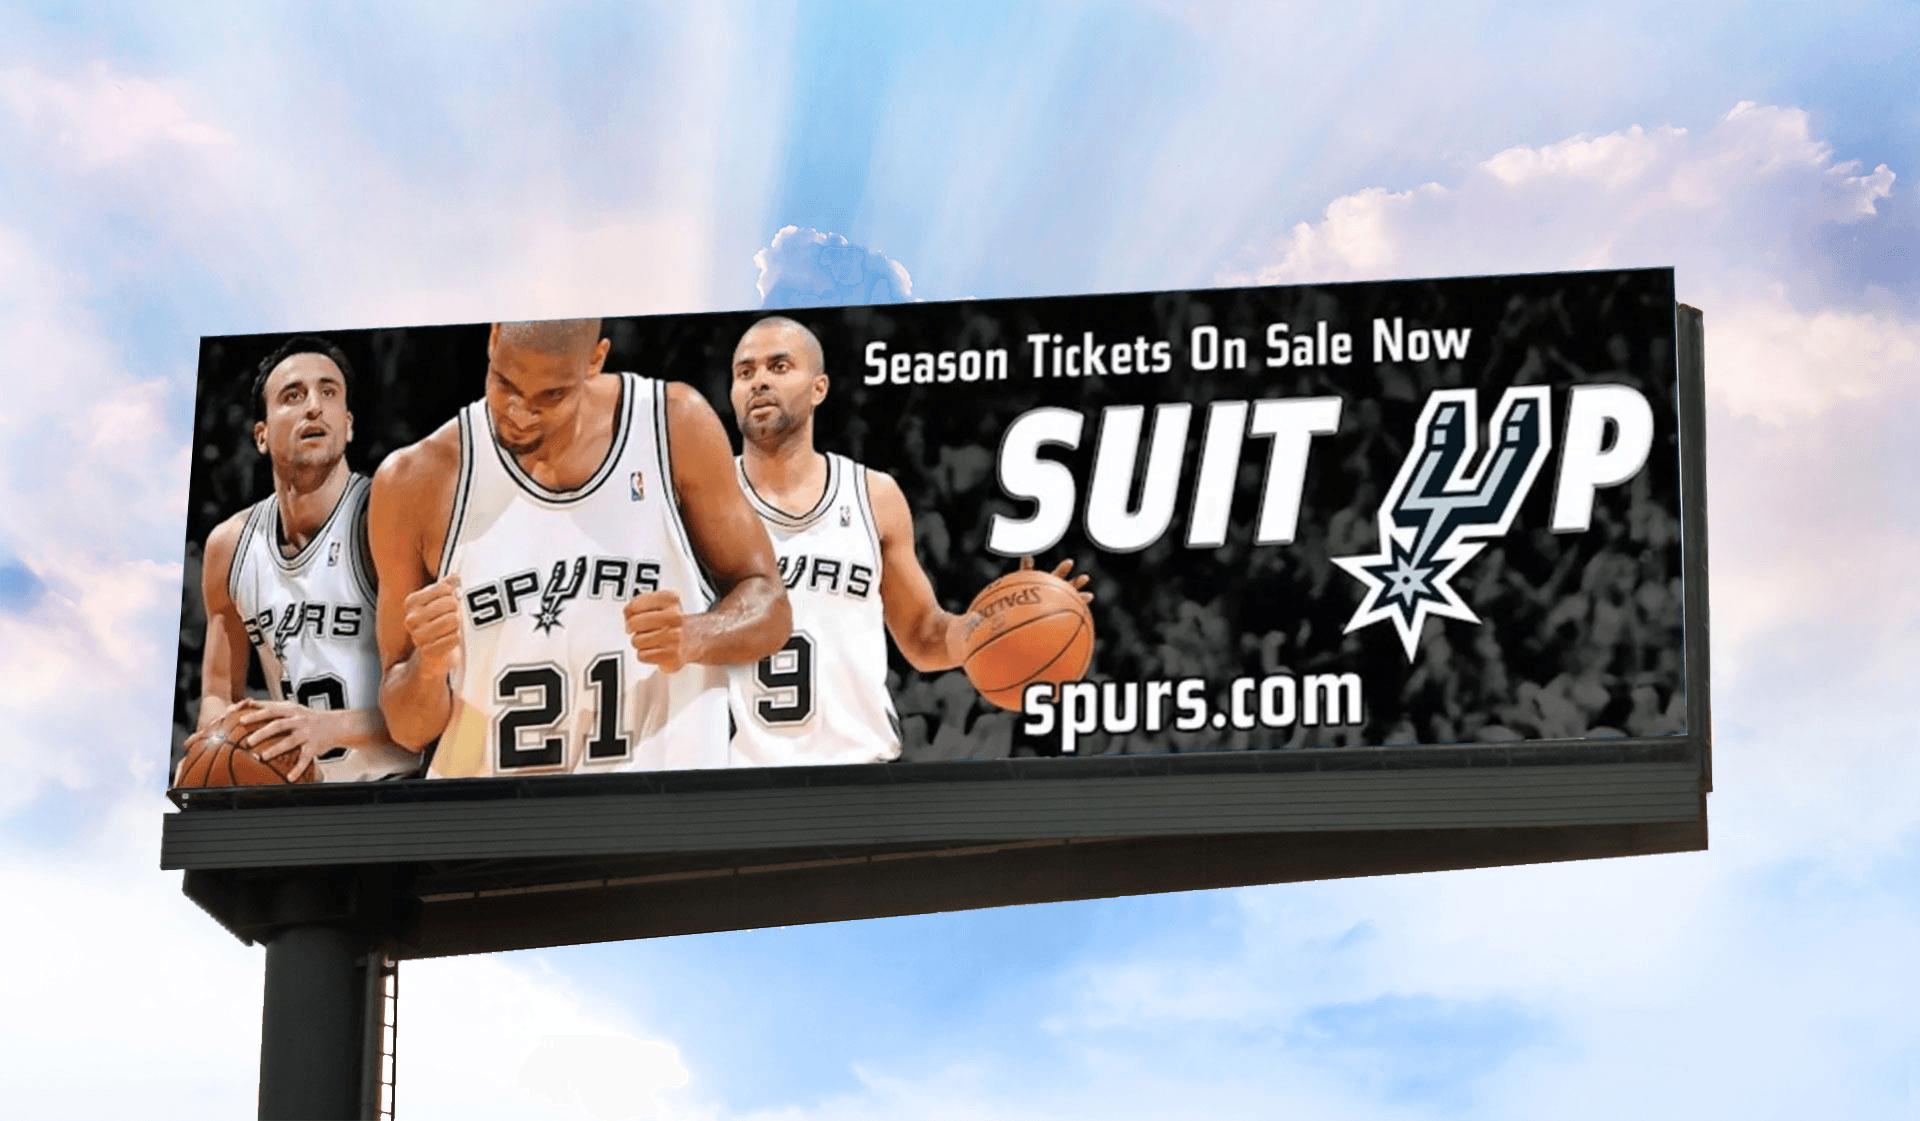 Spurs Suit Up Billboard